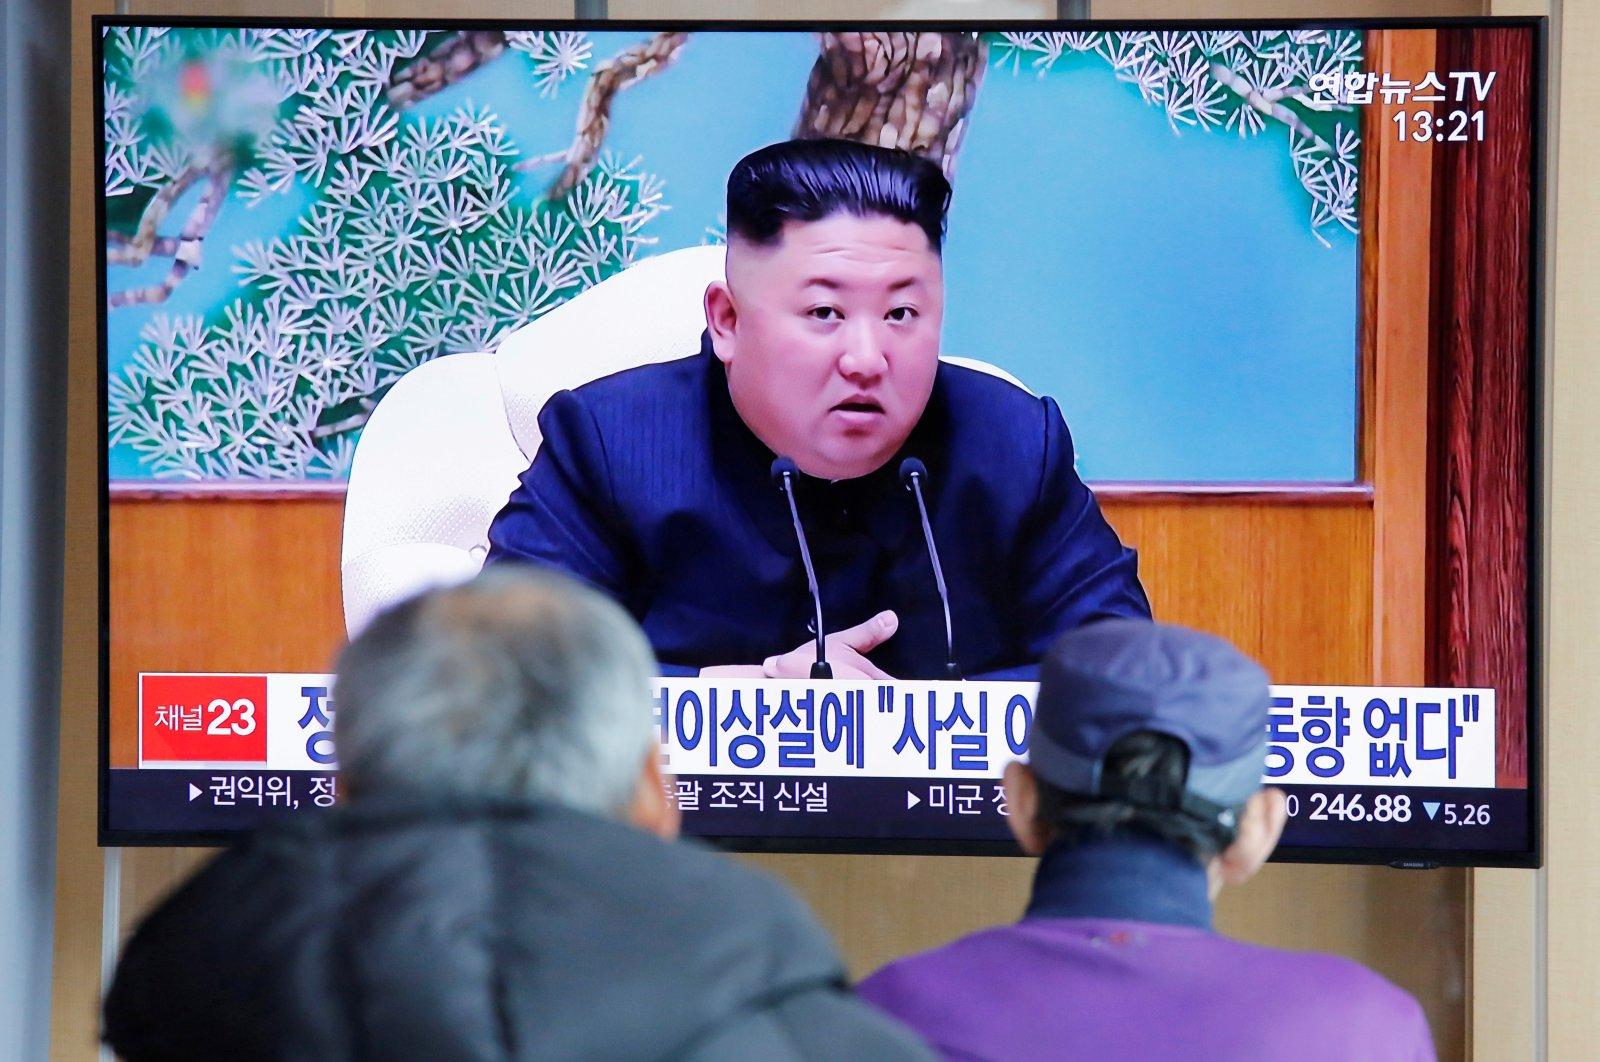 South Korean's watch a TV broadcasting a news report on North Korean leader Kim Jong Un, Seoul, April 21, 2020. (Reuters Photo)